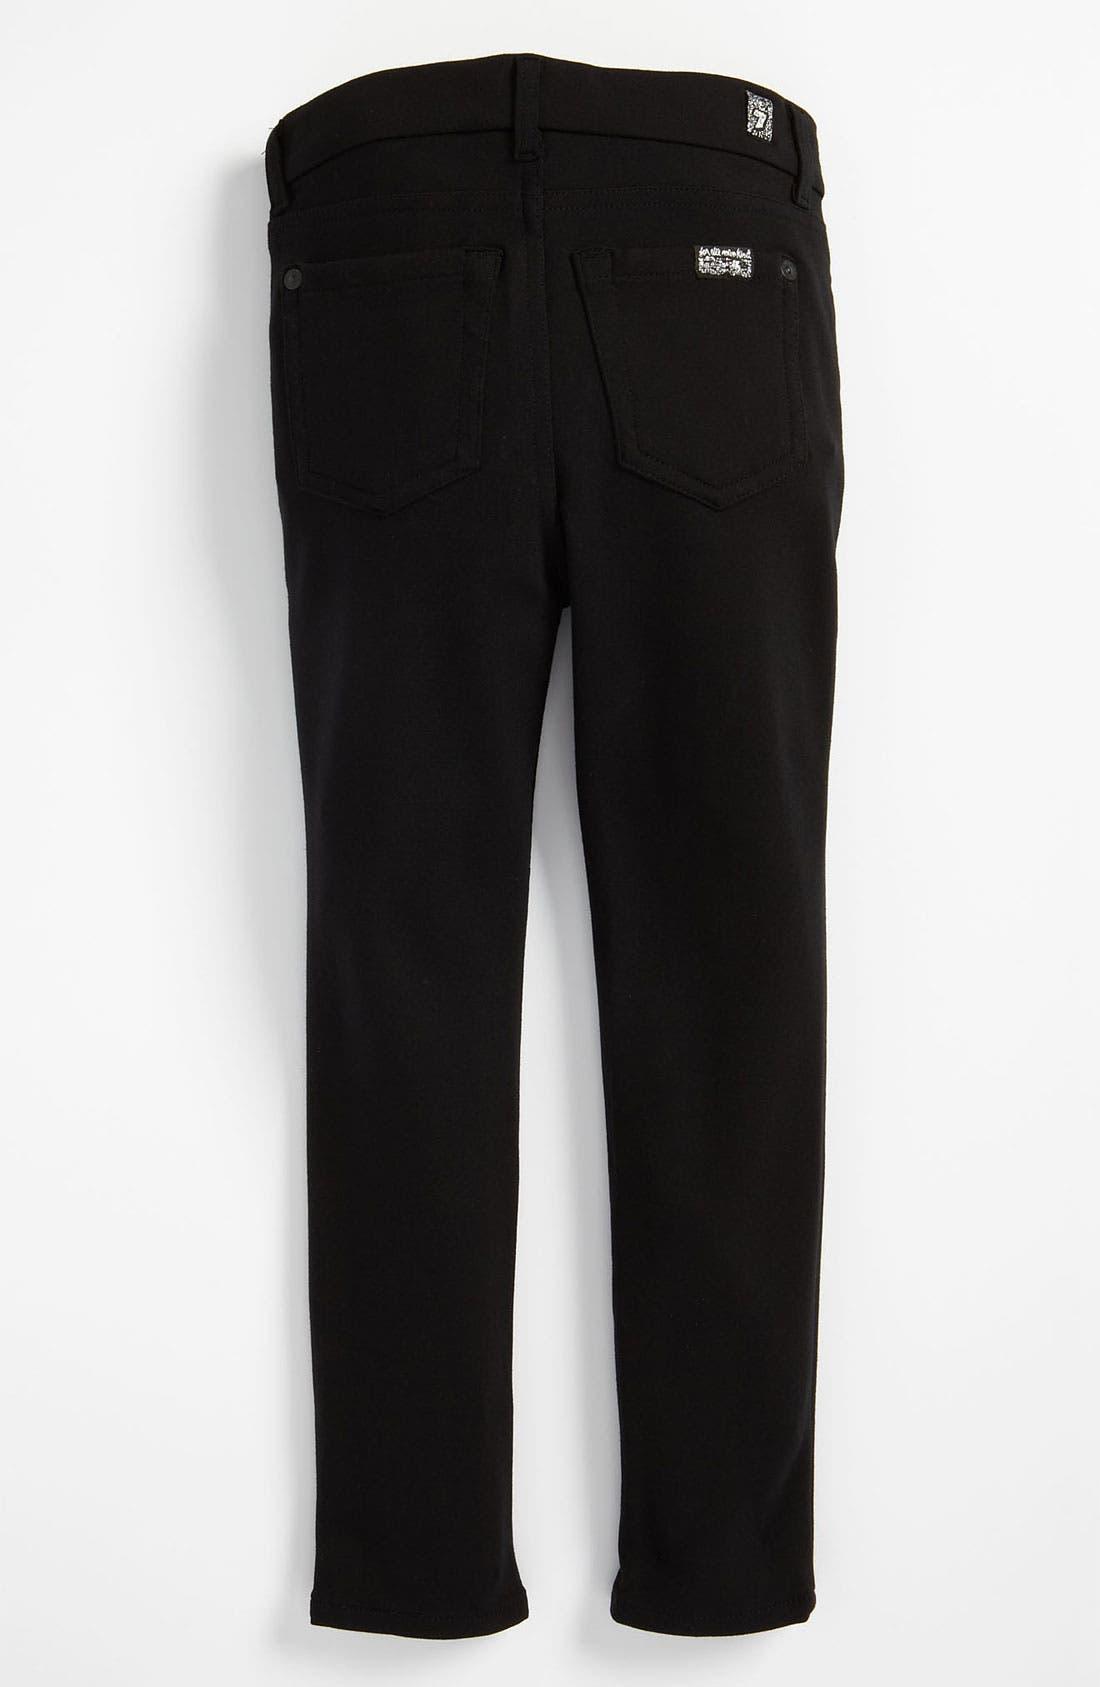 Alternate Image 1 Selected - 7 For All Mankind® Ponte Knit Pants (Big Girls)